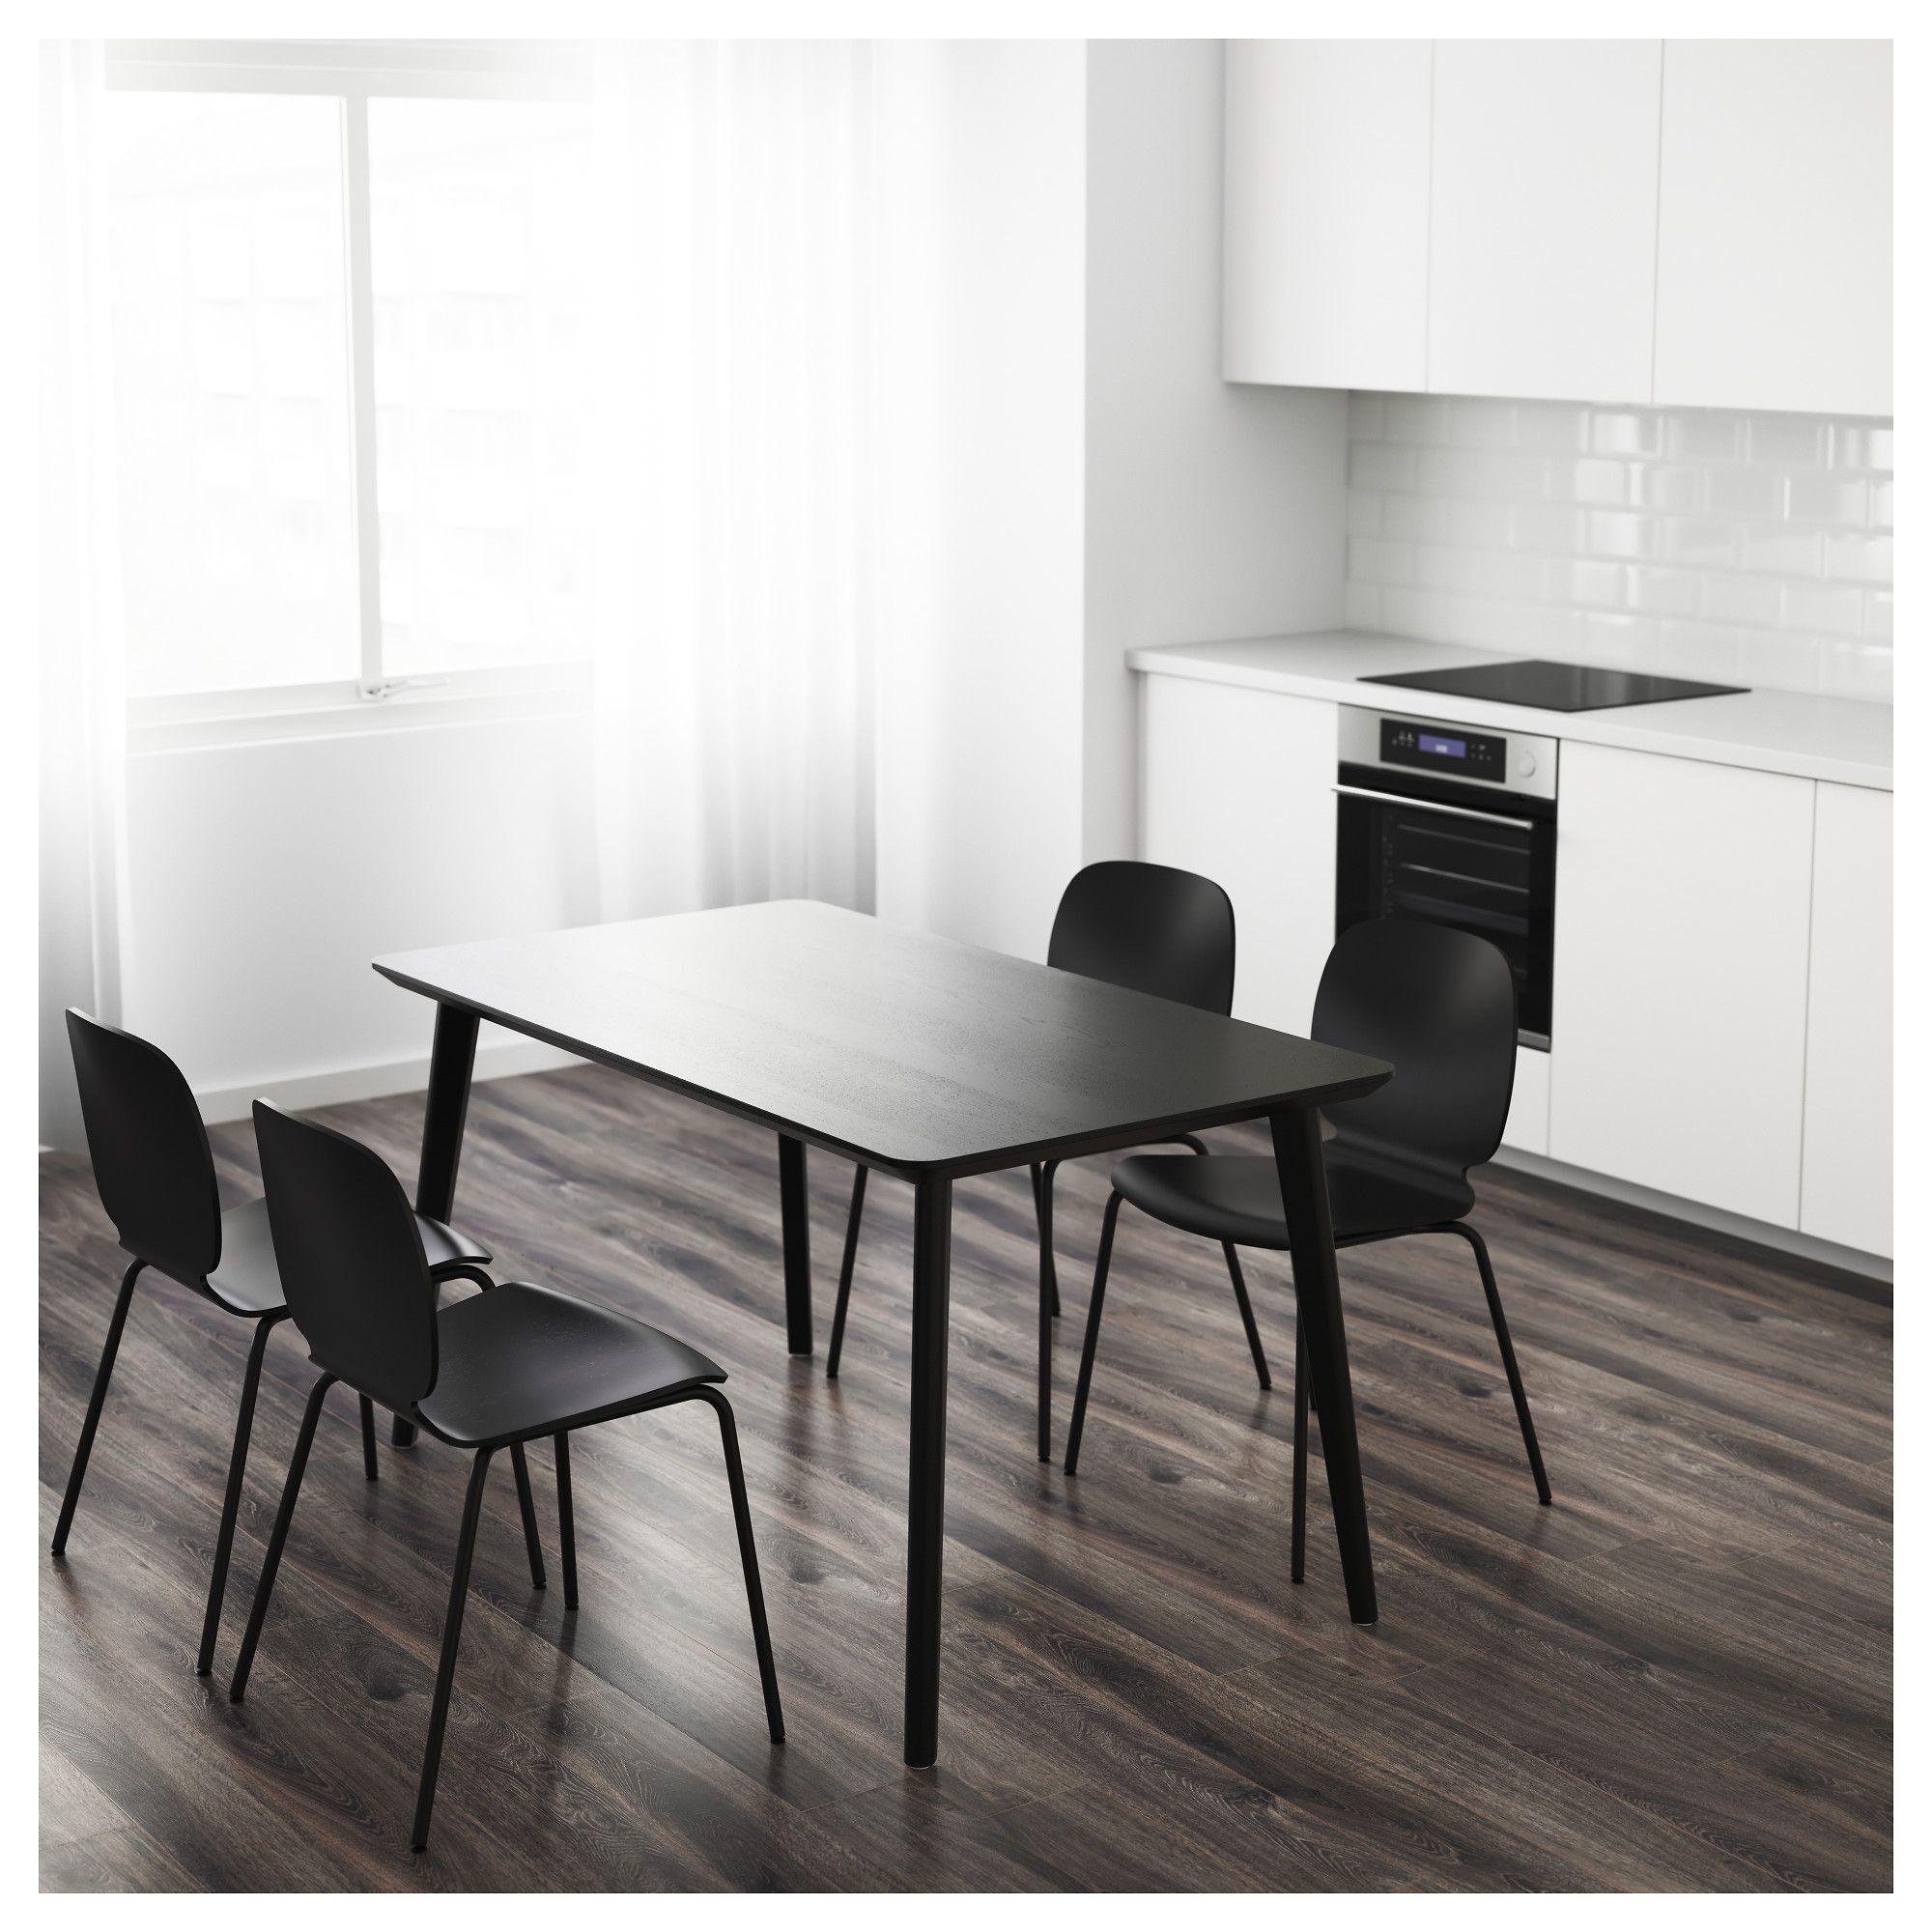 "LISABO Table black 55 1/8x30 3/4 "" (140x78 cm) Kitchen"